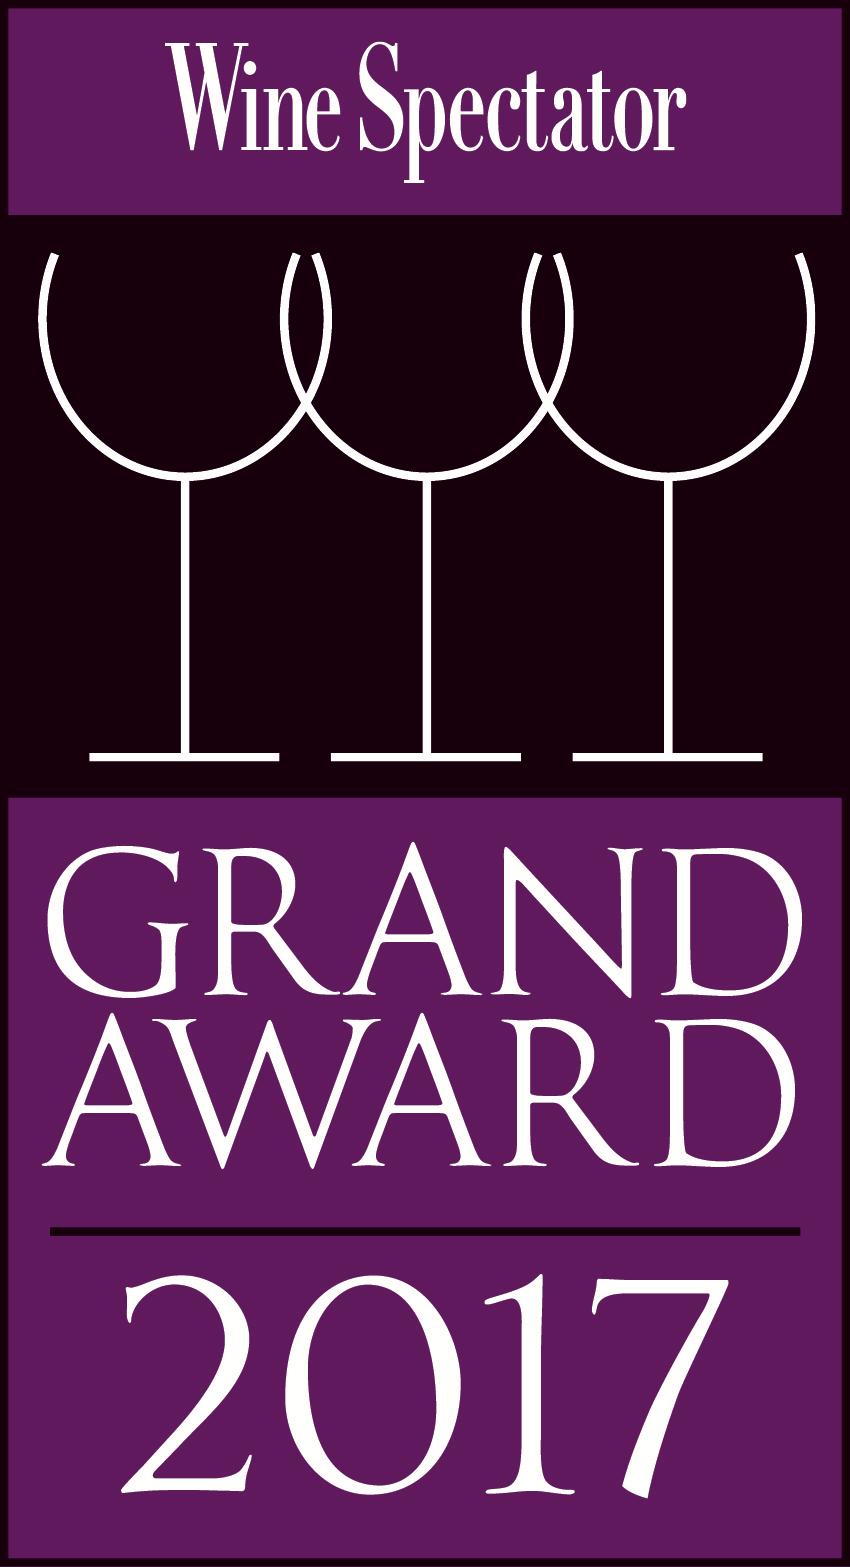 Wine Spectator Grand Award